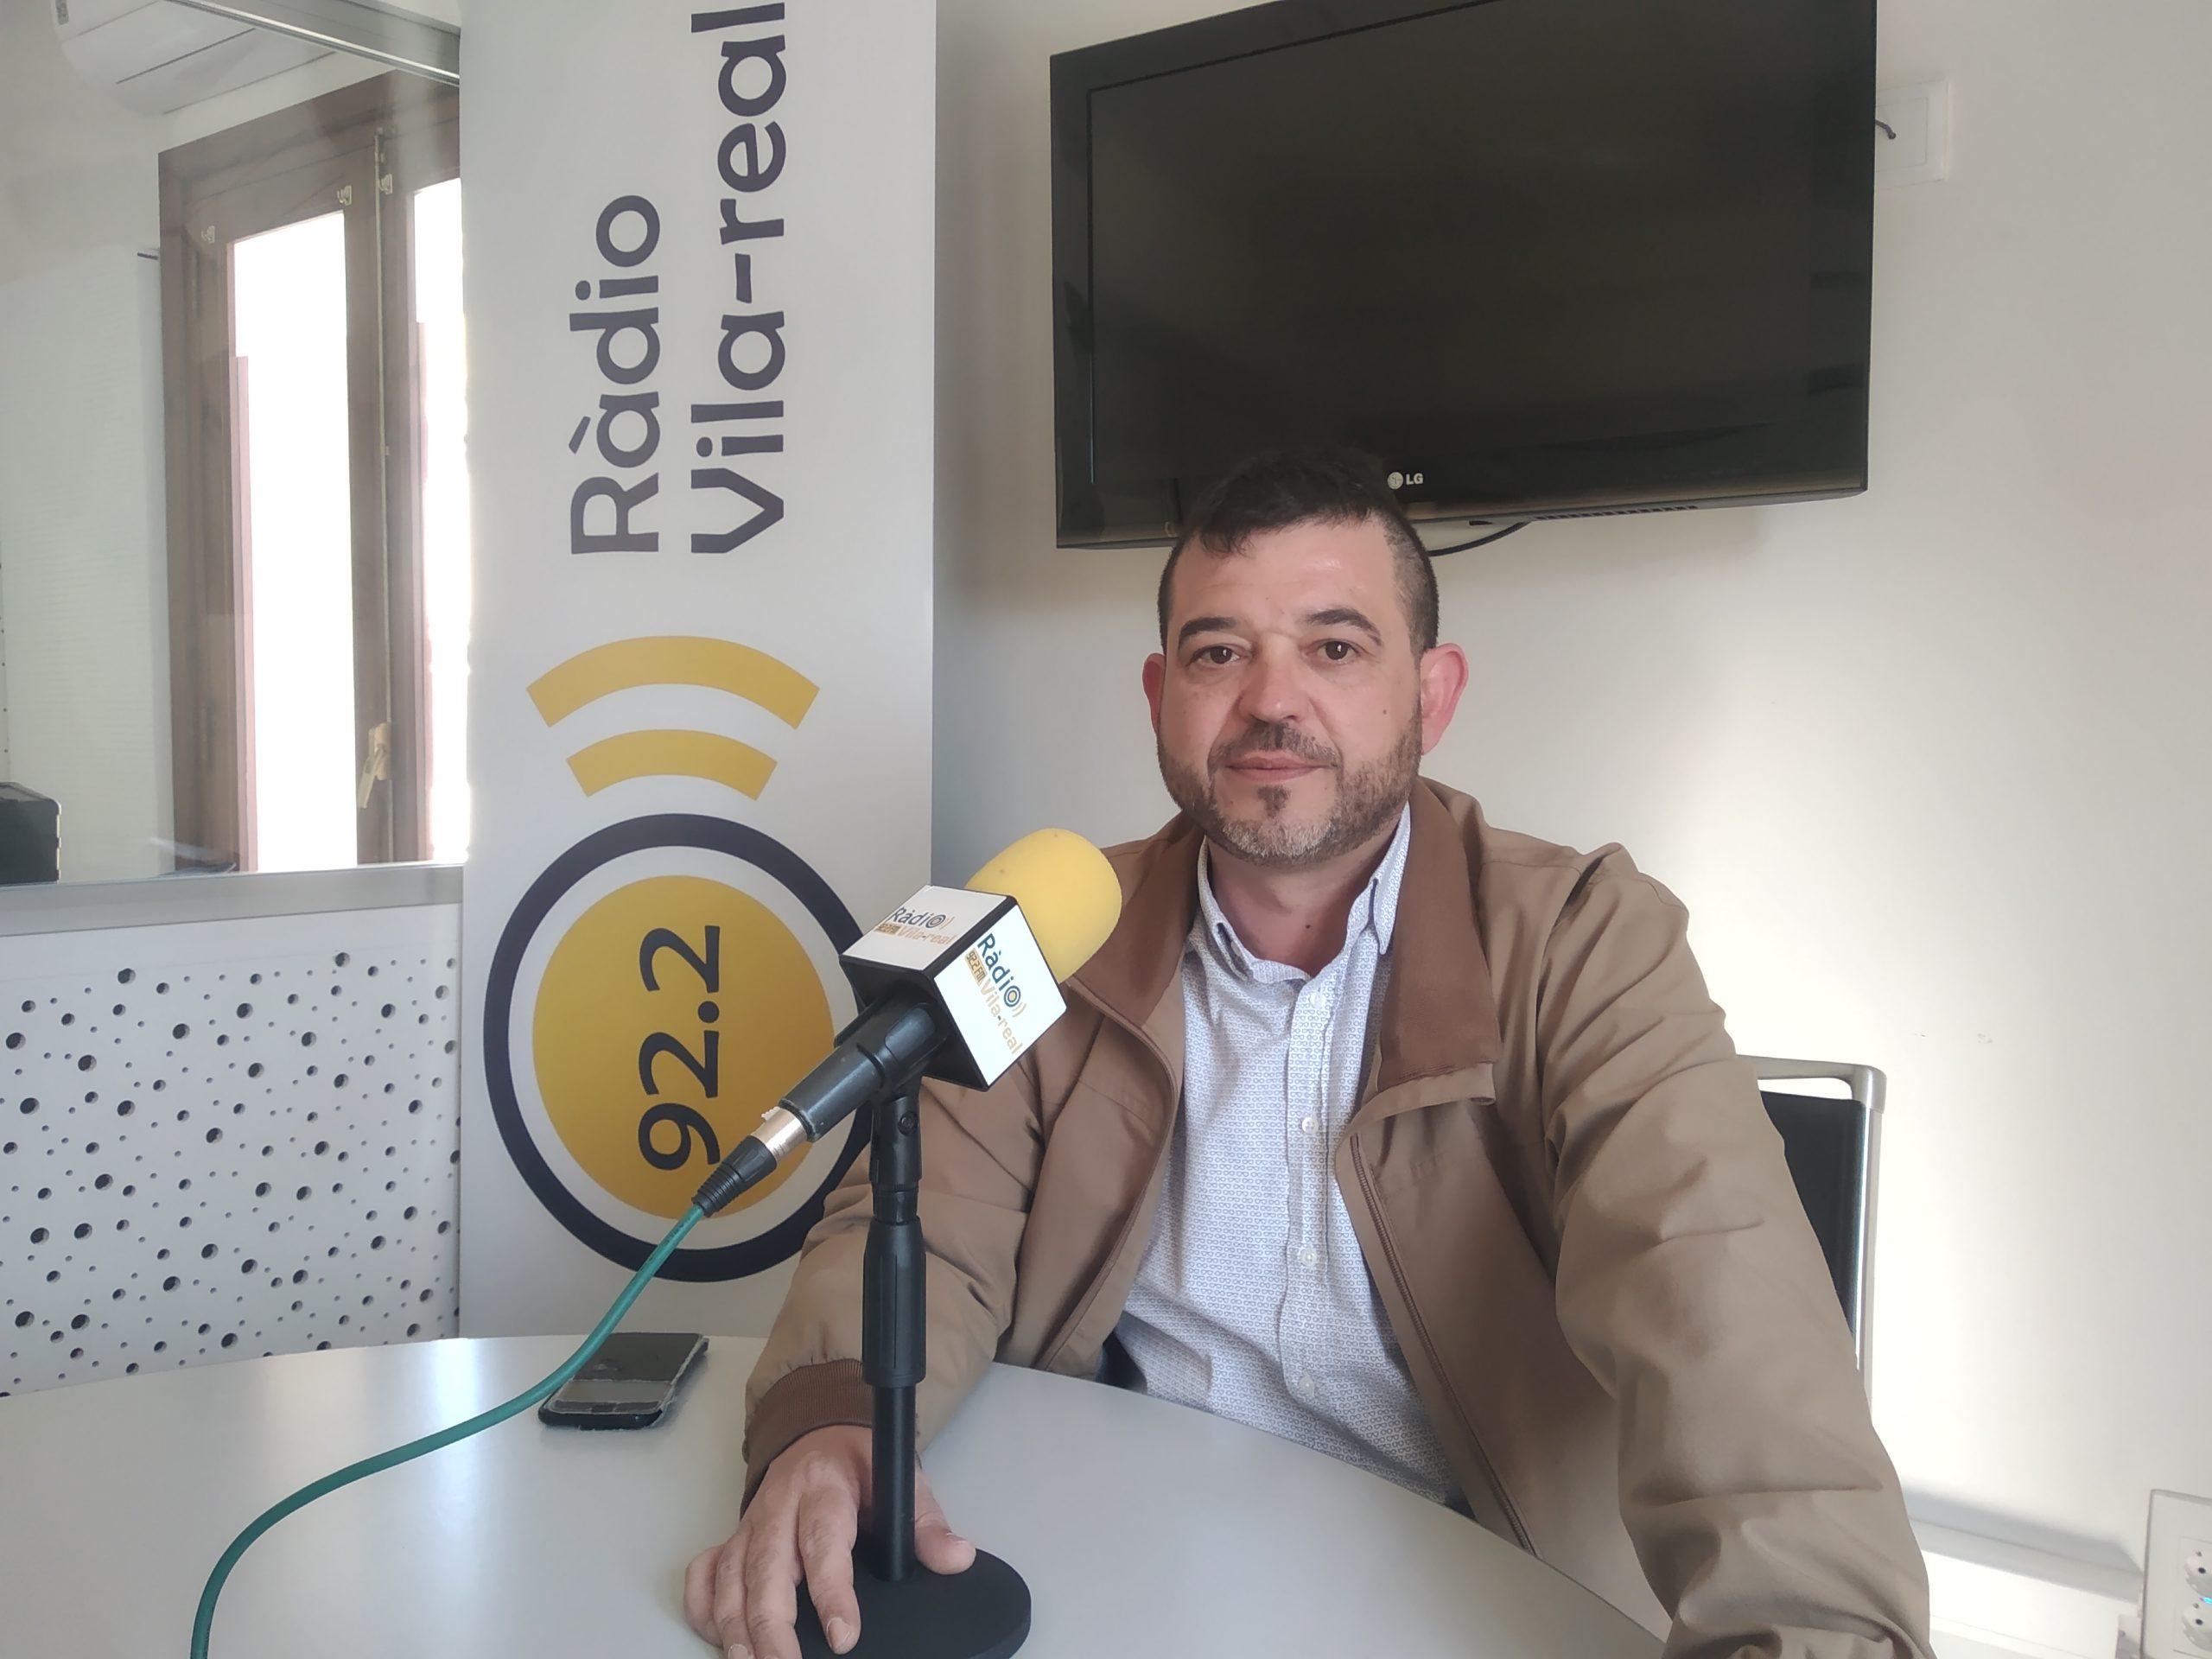 Entrevista a Roberto Recuero, responsable del SanSan Festival de Benicàssim